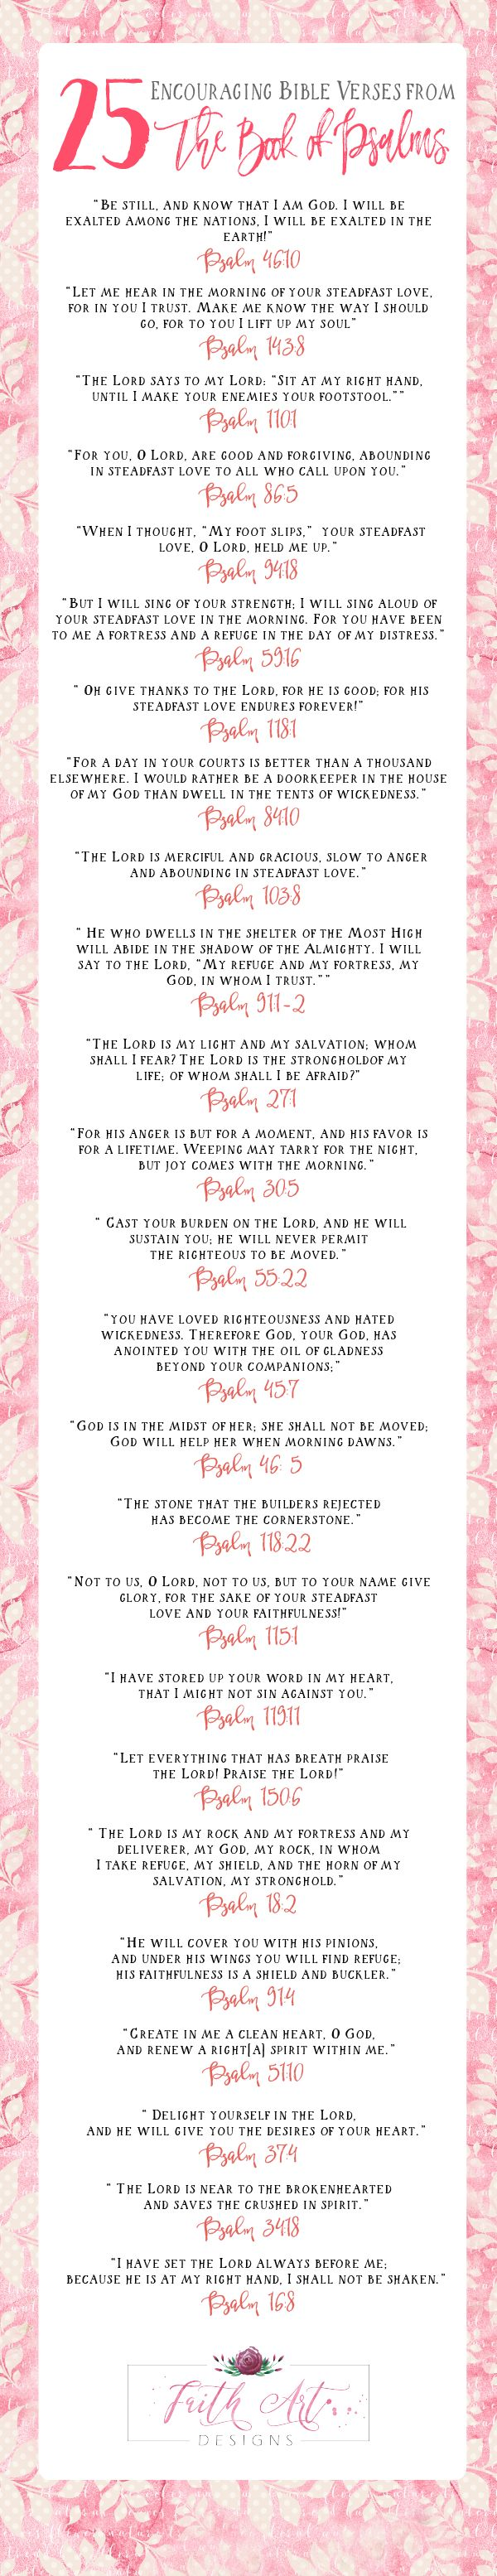 best 25 book of life bible ideas on pinterest living bible